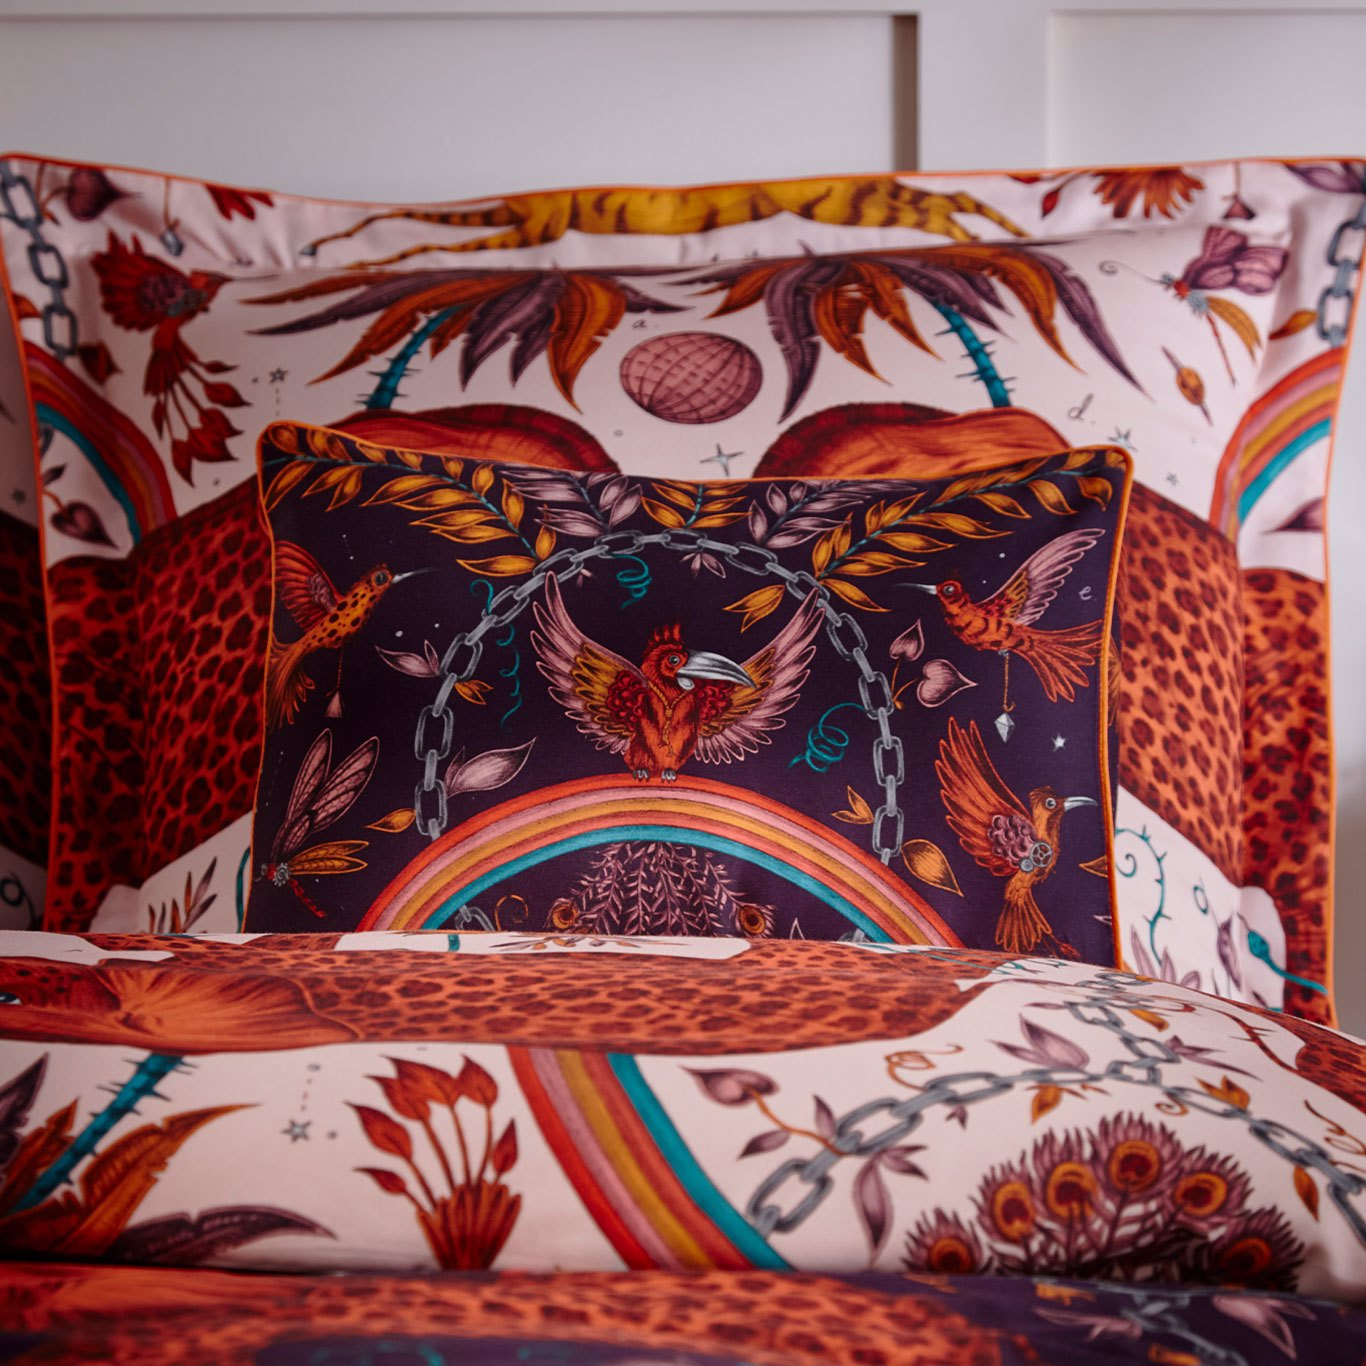 Zambezi 30X40 Boudoir Pillowcase by EMS